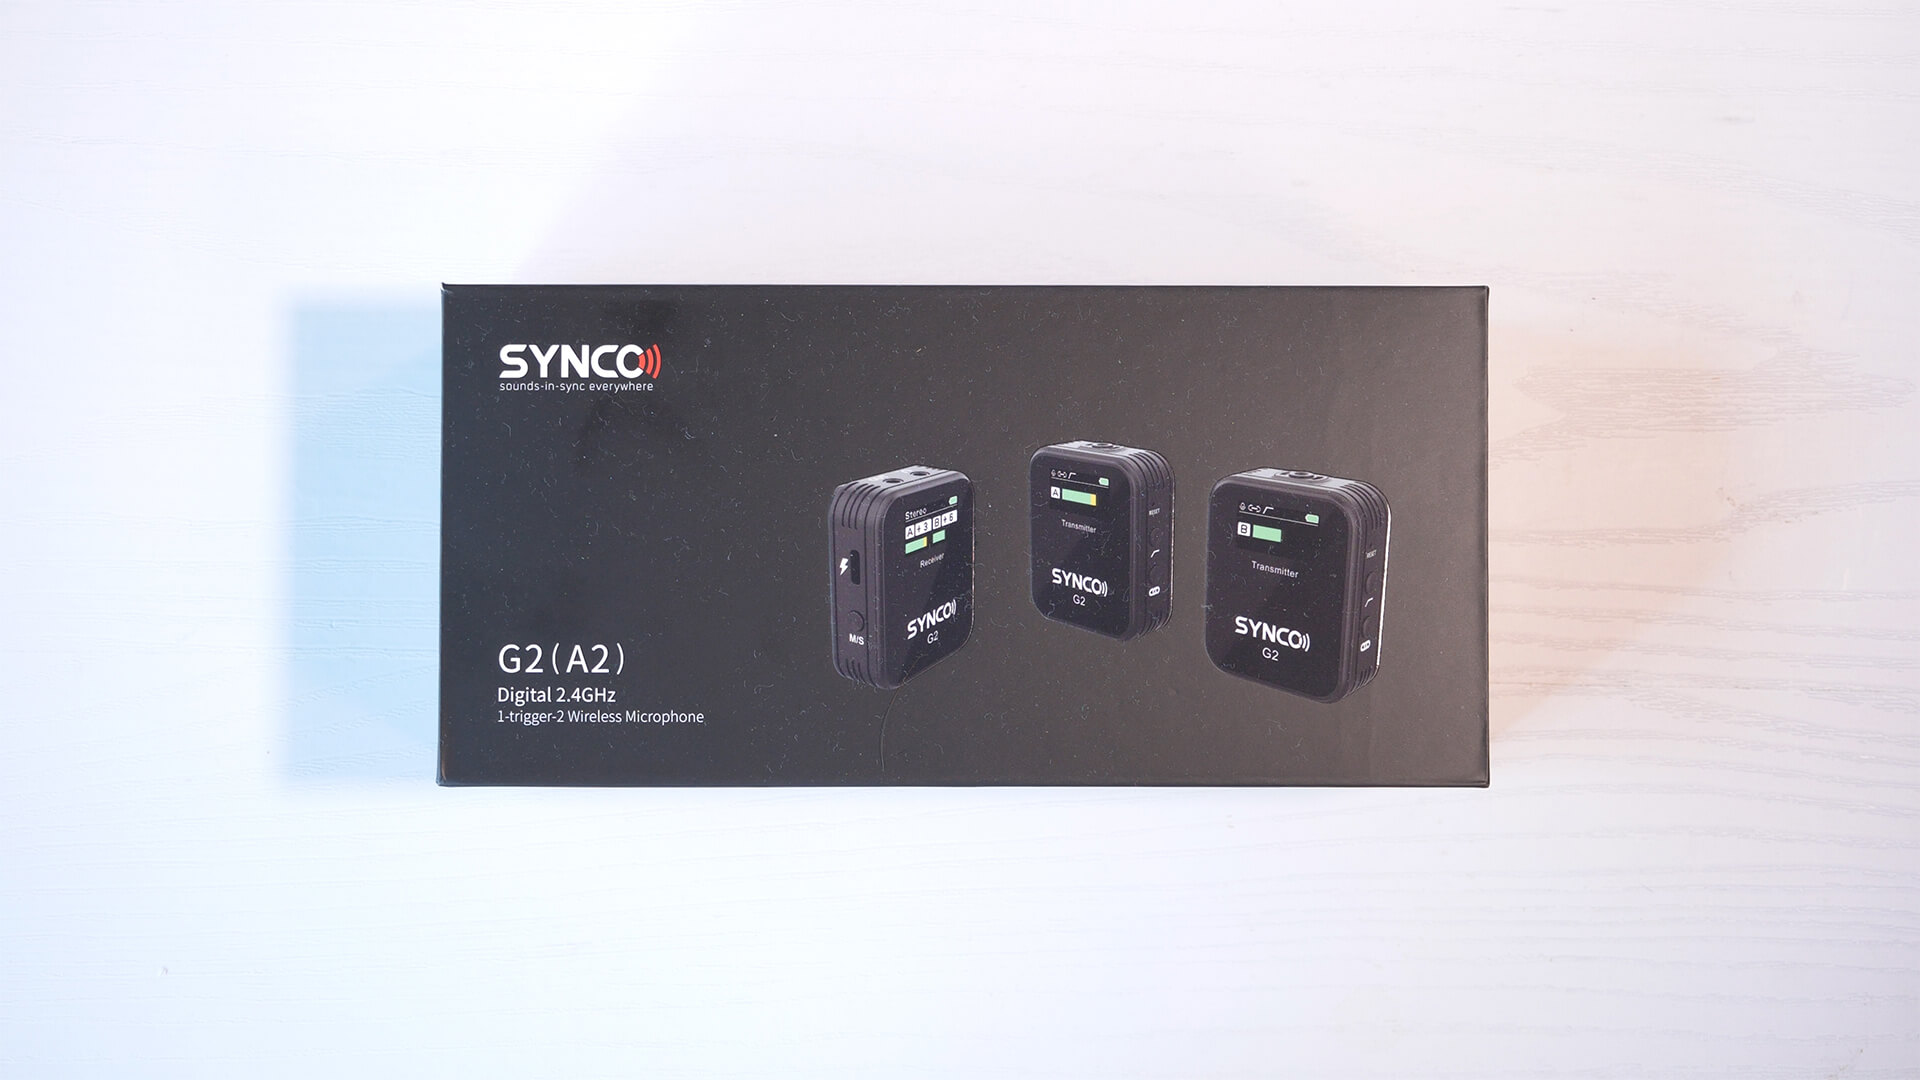 Synco G2(A2)の梱包パッケージ